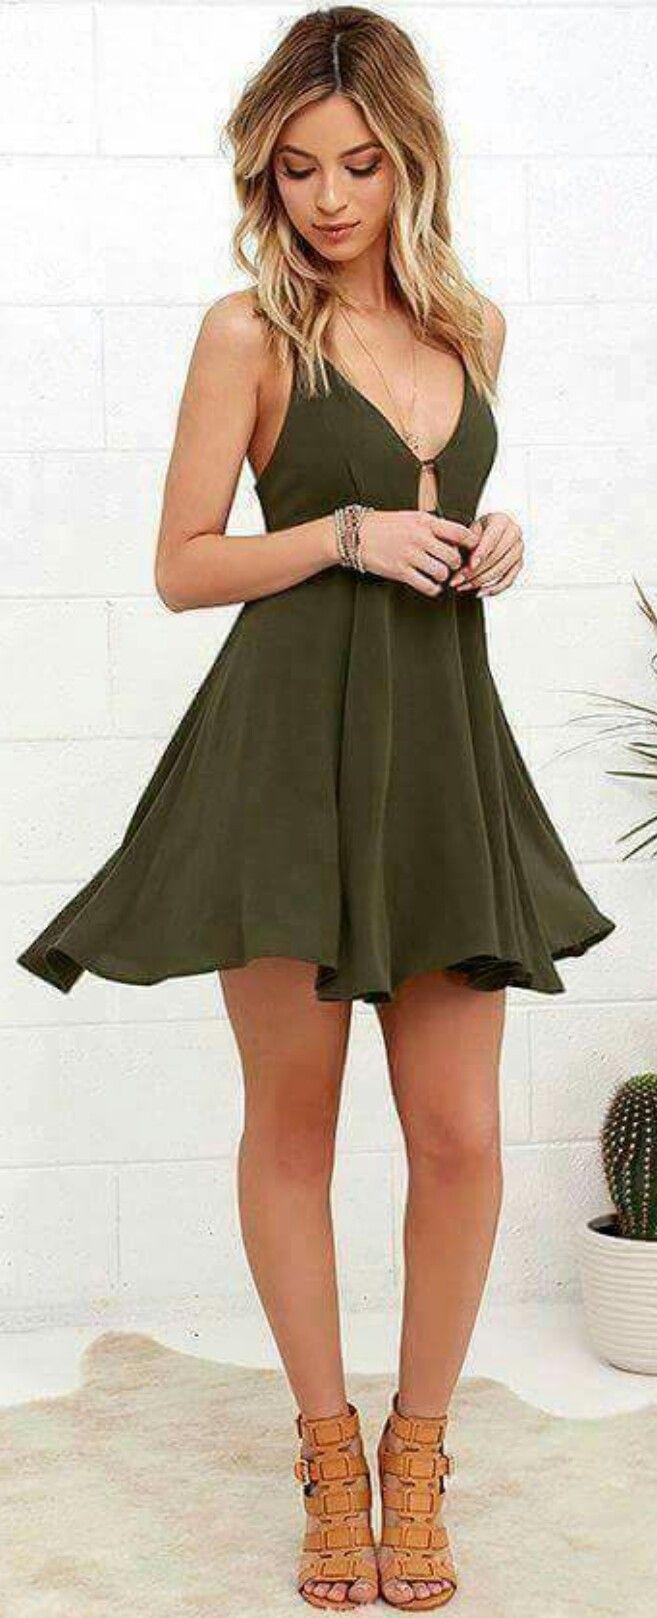 Pin By Ashley Hunek On Fashion Short Summer Dresses Fashion Clothes [ 1618 x 657 Pixel ]